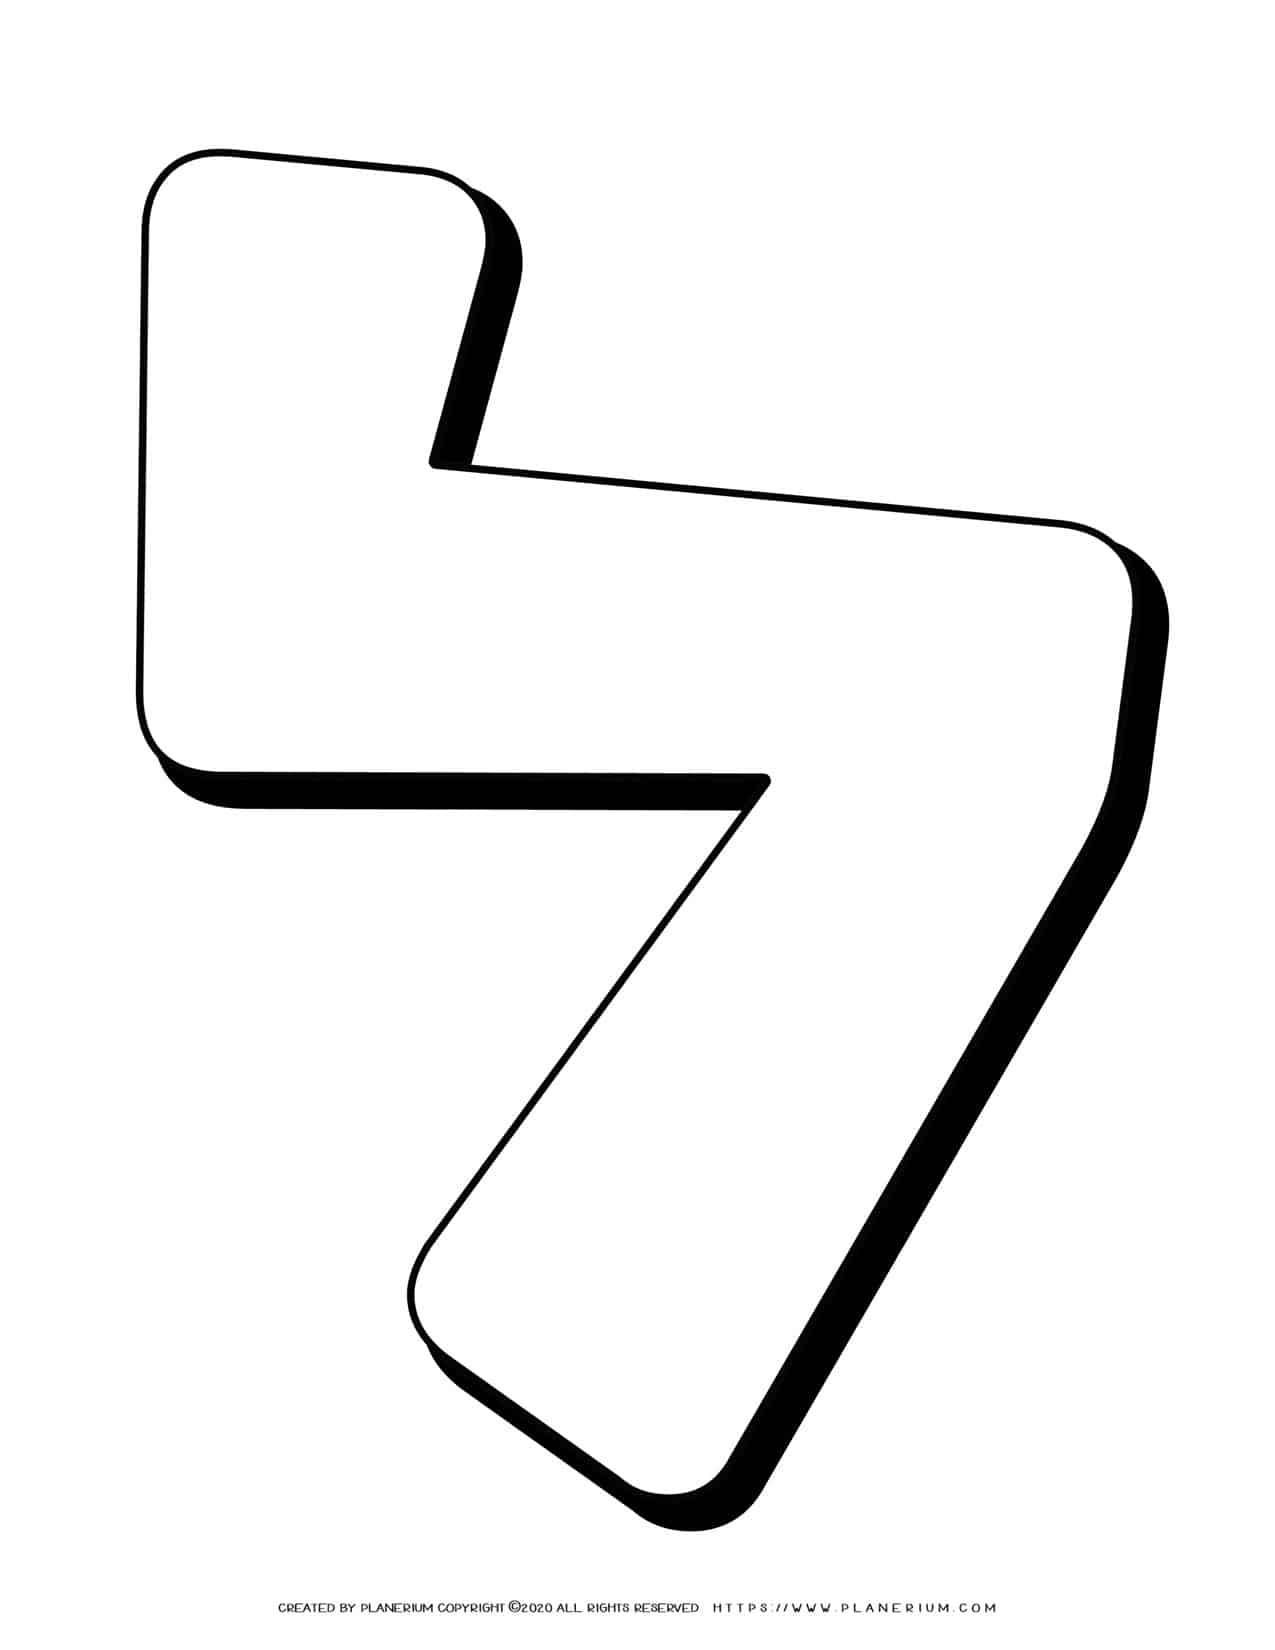 Hebrew Alphabet - Lamed - Coloring Page   Planerium